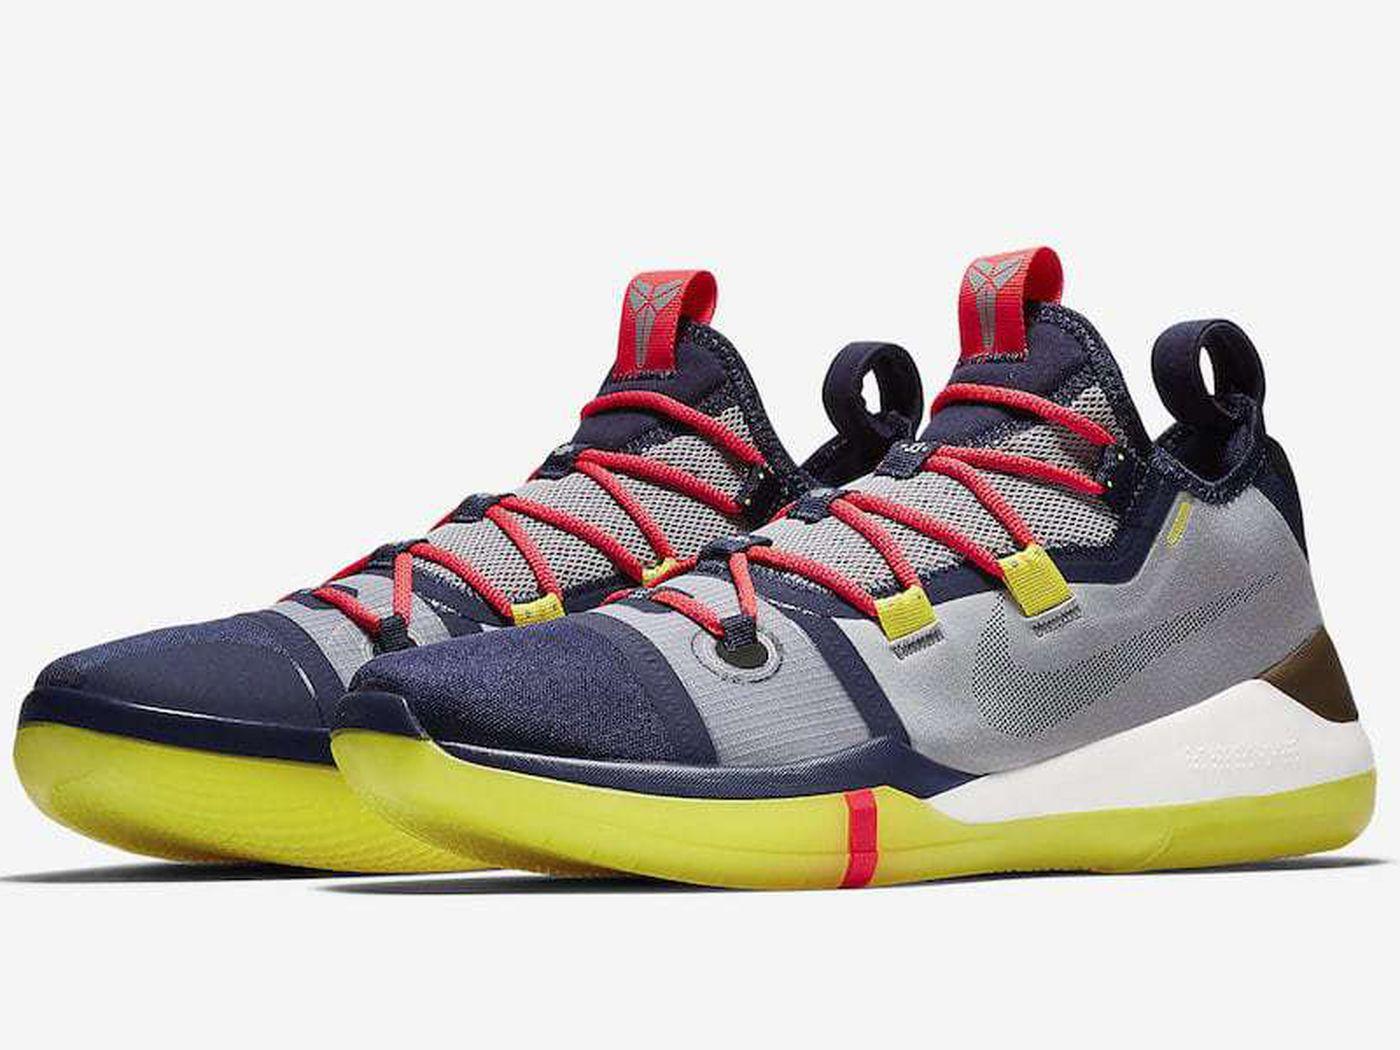 de44f2b5c2a0 Nike s new Kobe A.D. signature shoe has dropped - SBNation.com